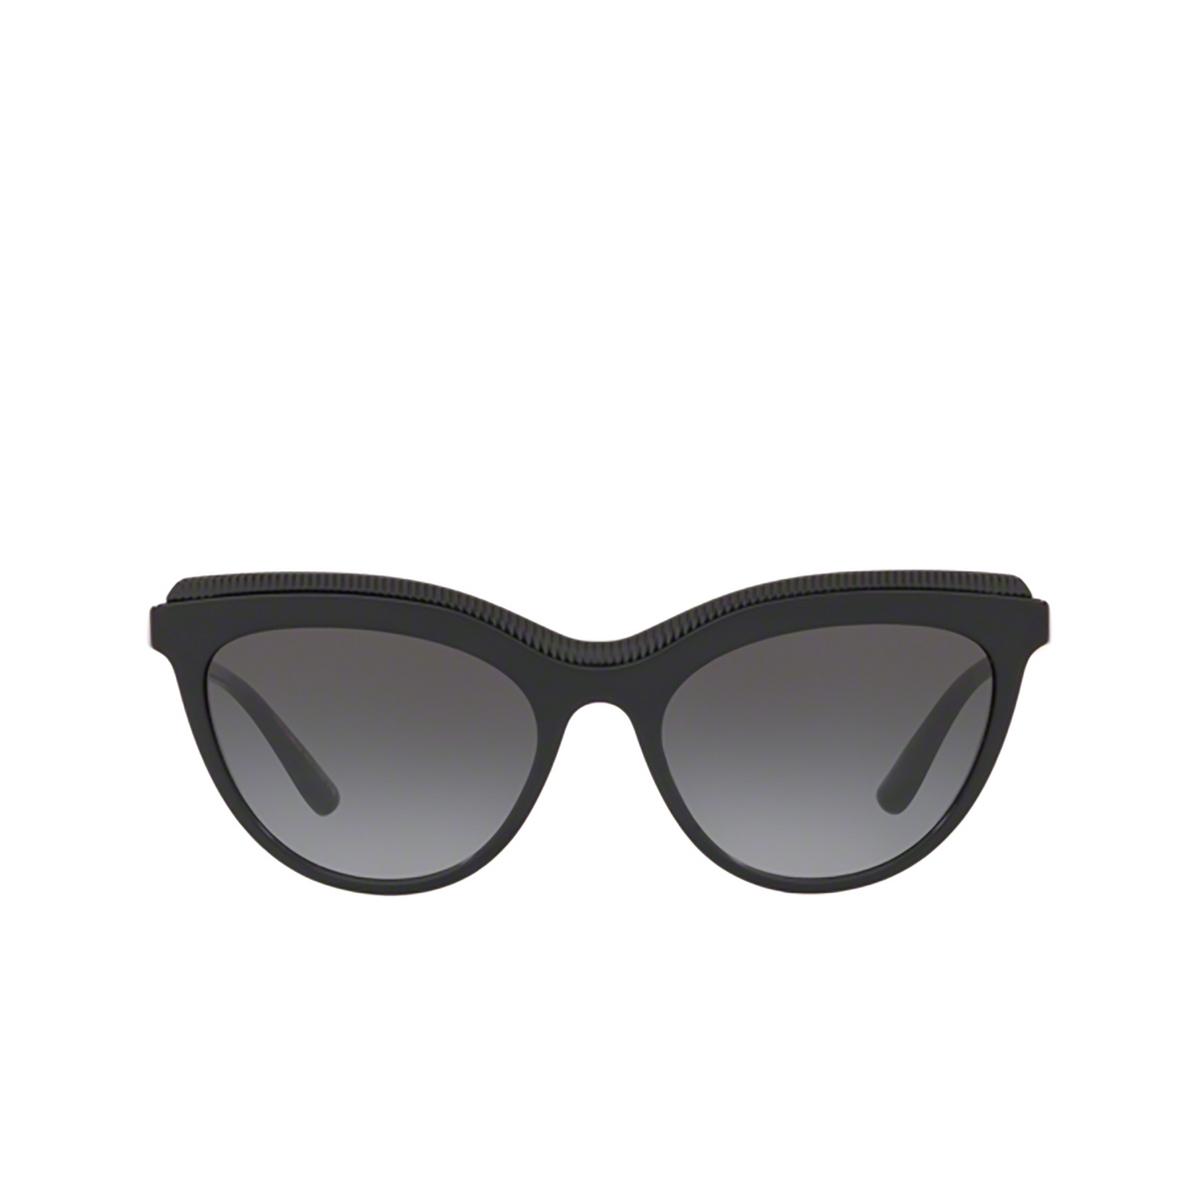 Dolce & Gabbana® Cat-eye Sunglasses: DG4335 color Black 501/8G - 1/3.